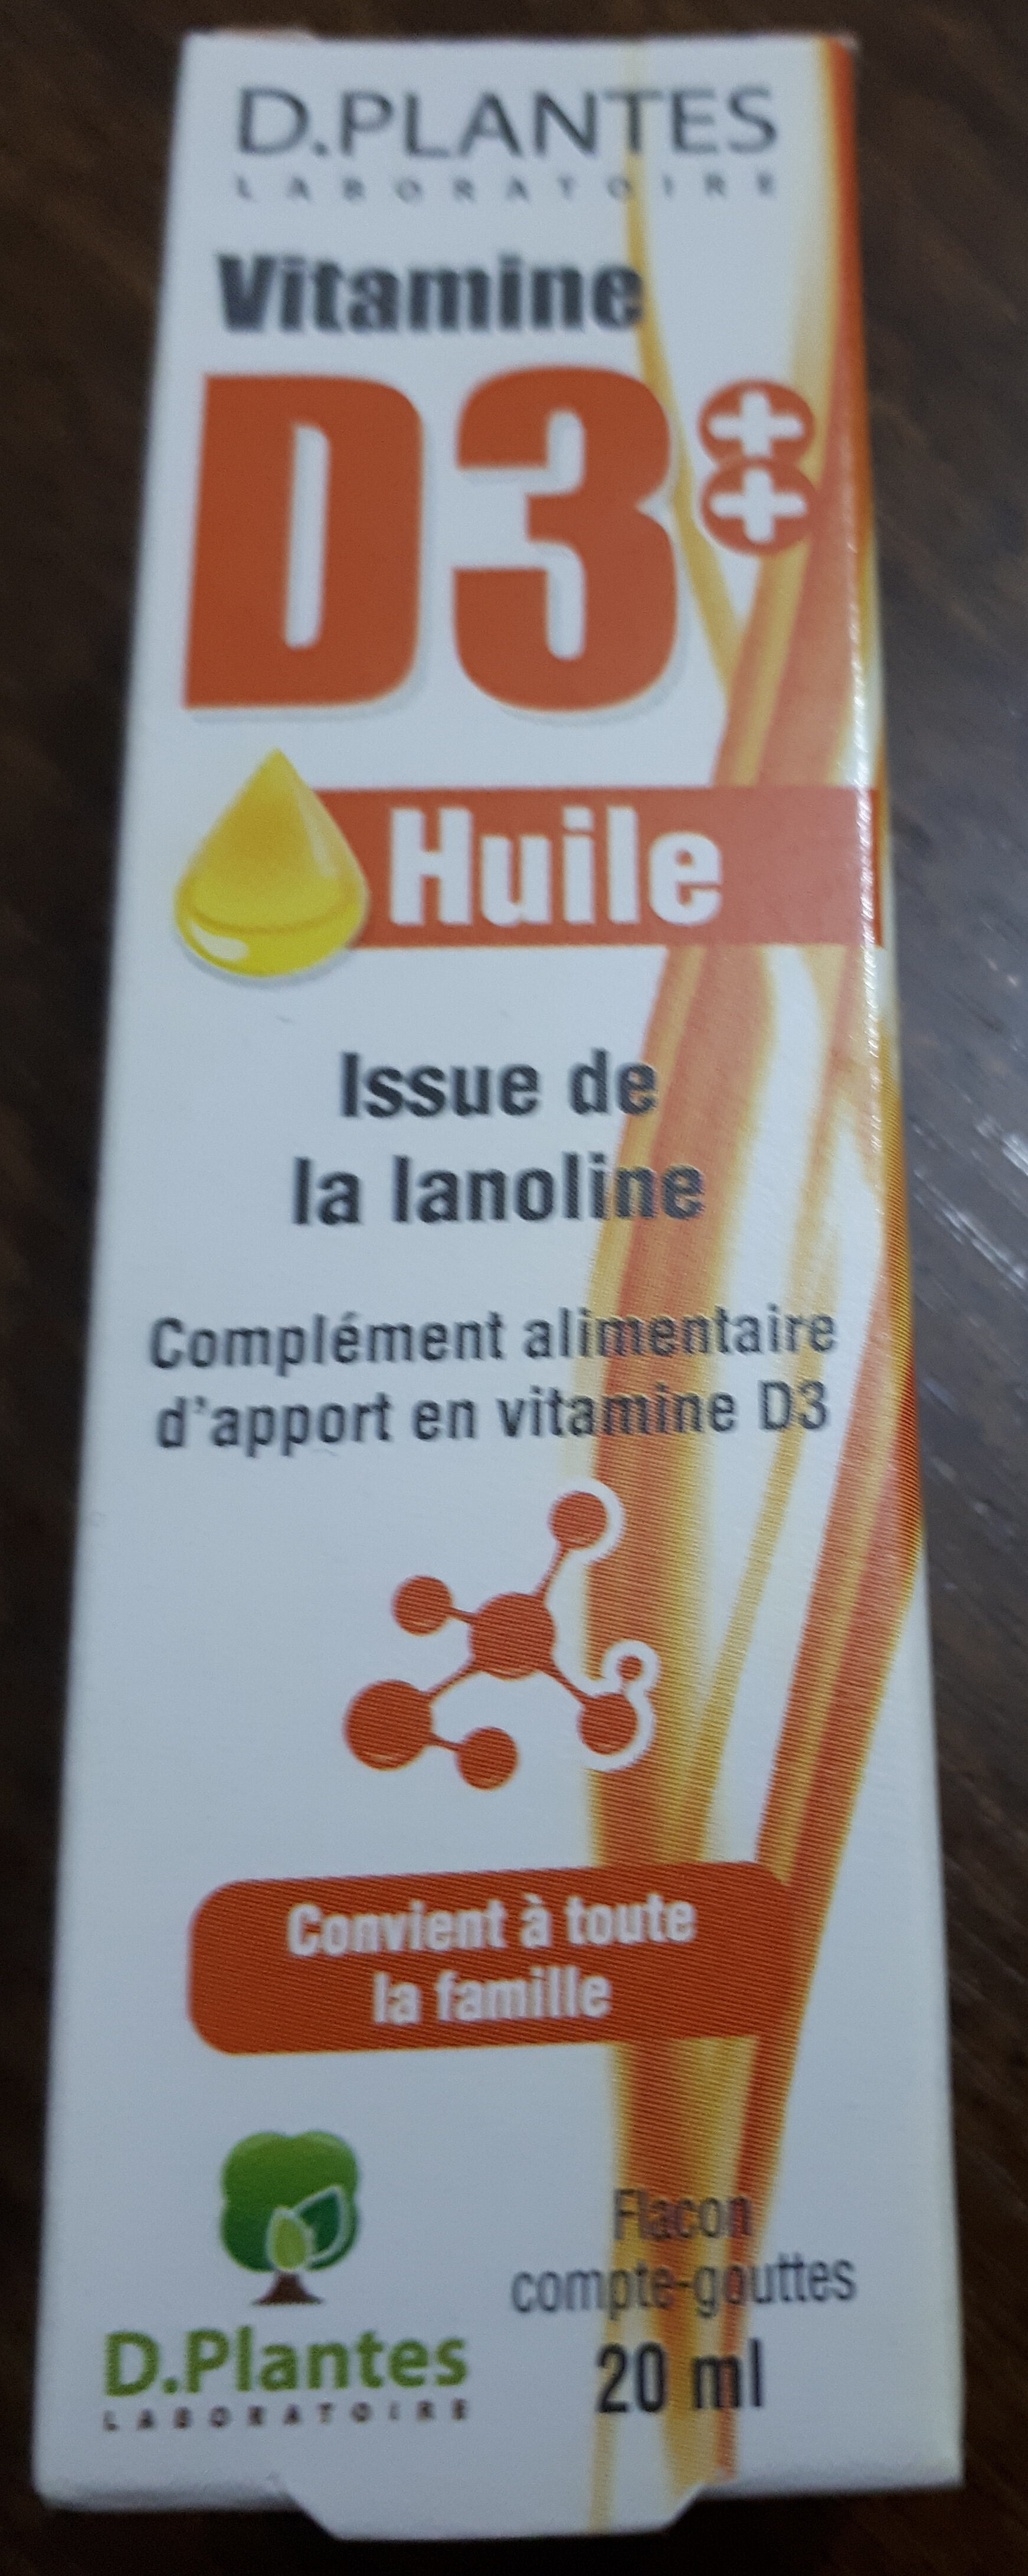 Vitamine D3++ Huile - Produit - fr